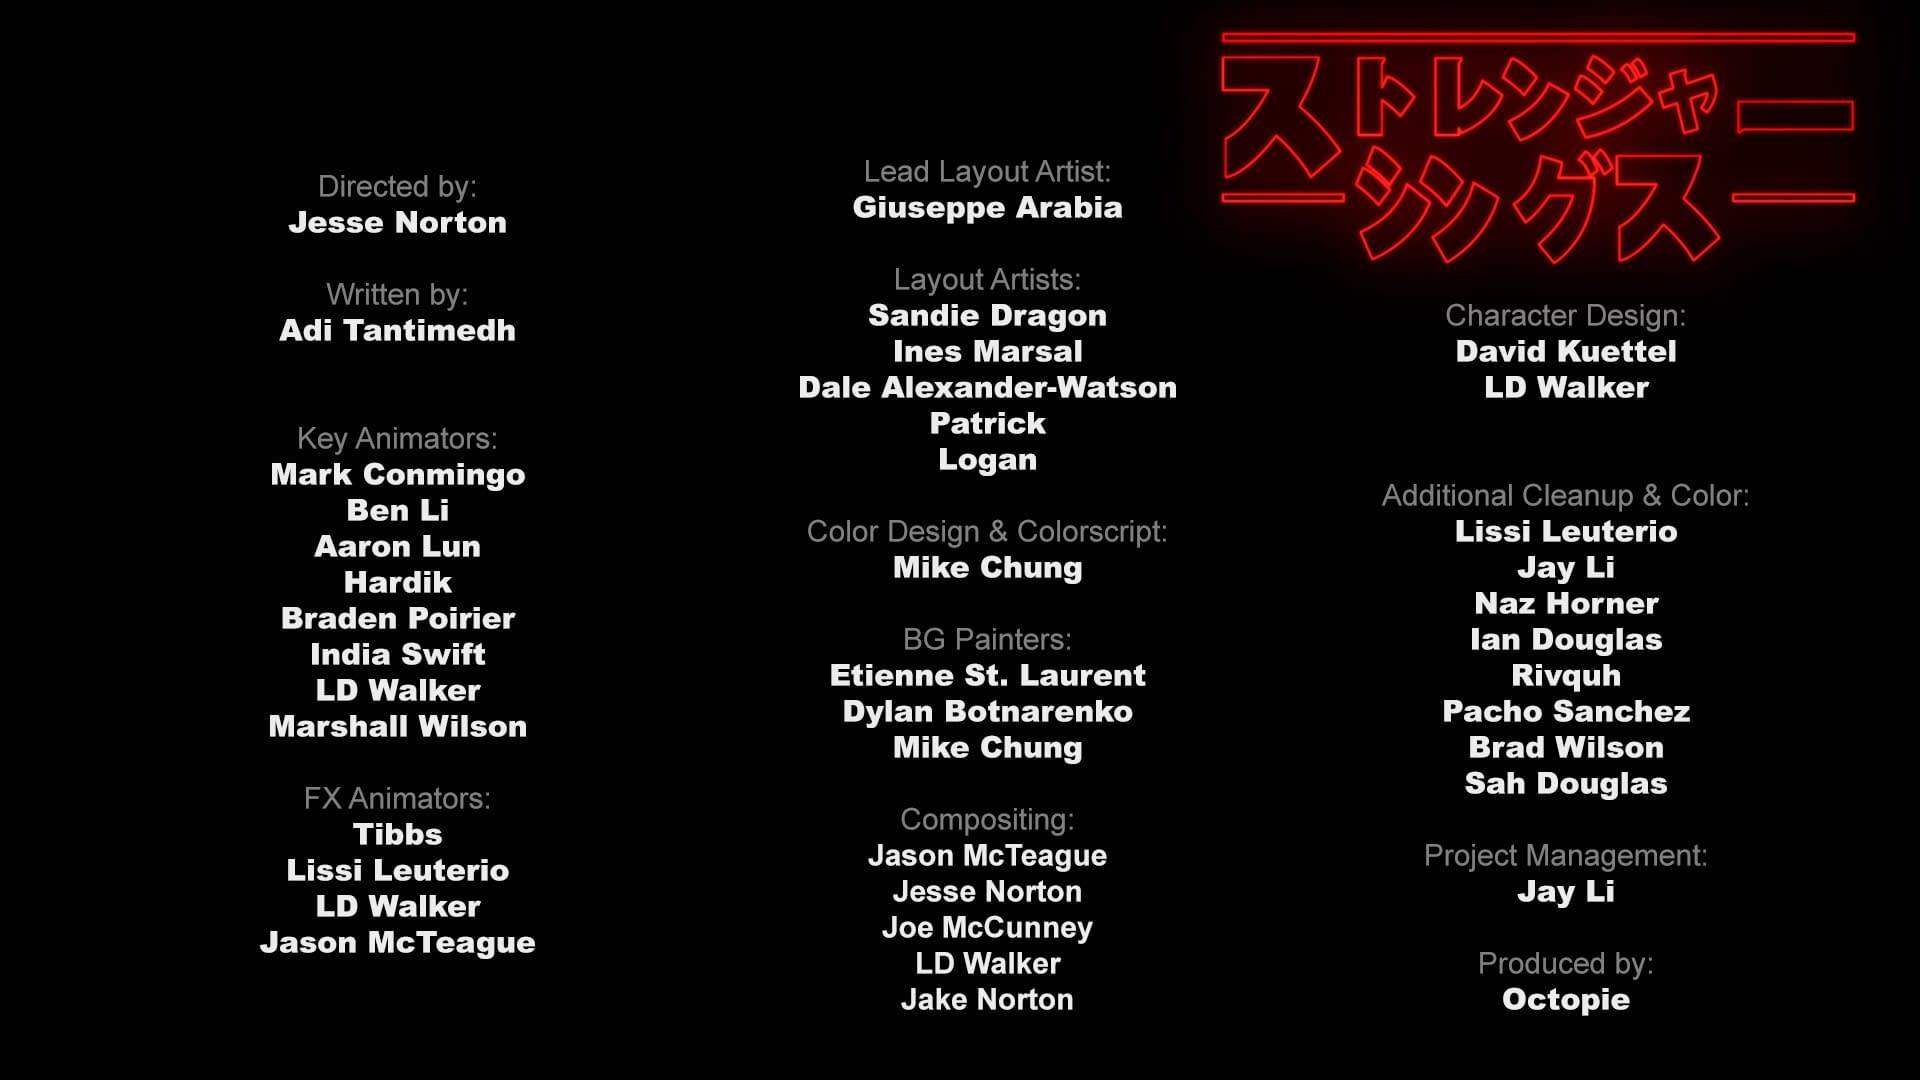 """Stranger Things"": Fates' Jesse Norton on Making That 80's Anime Fan Trailer [VIDEO]"